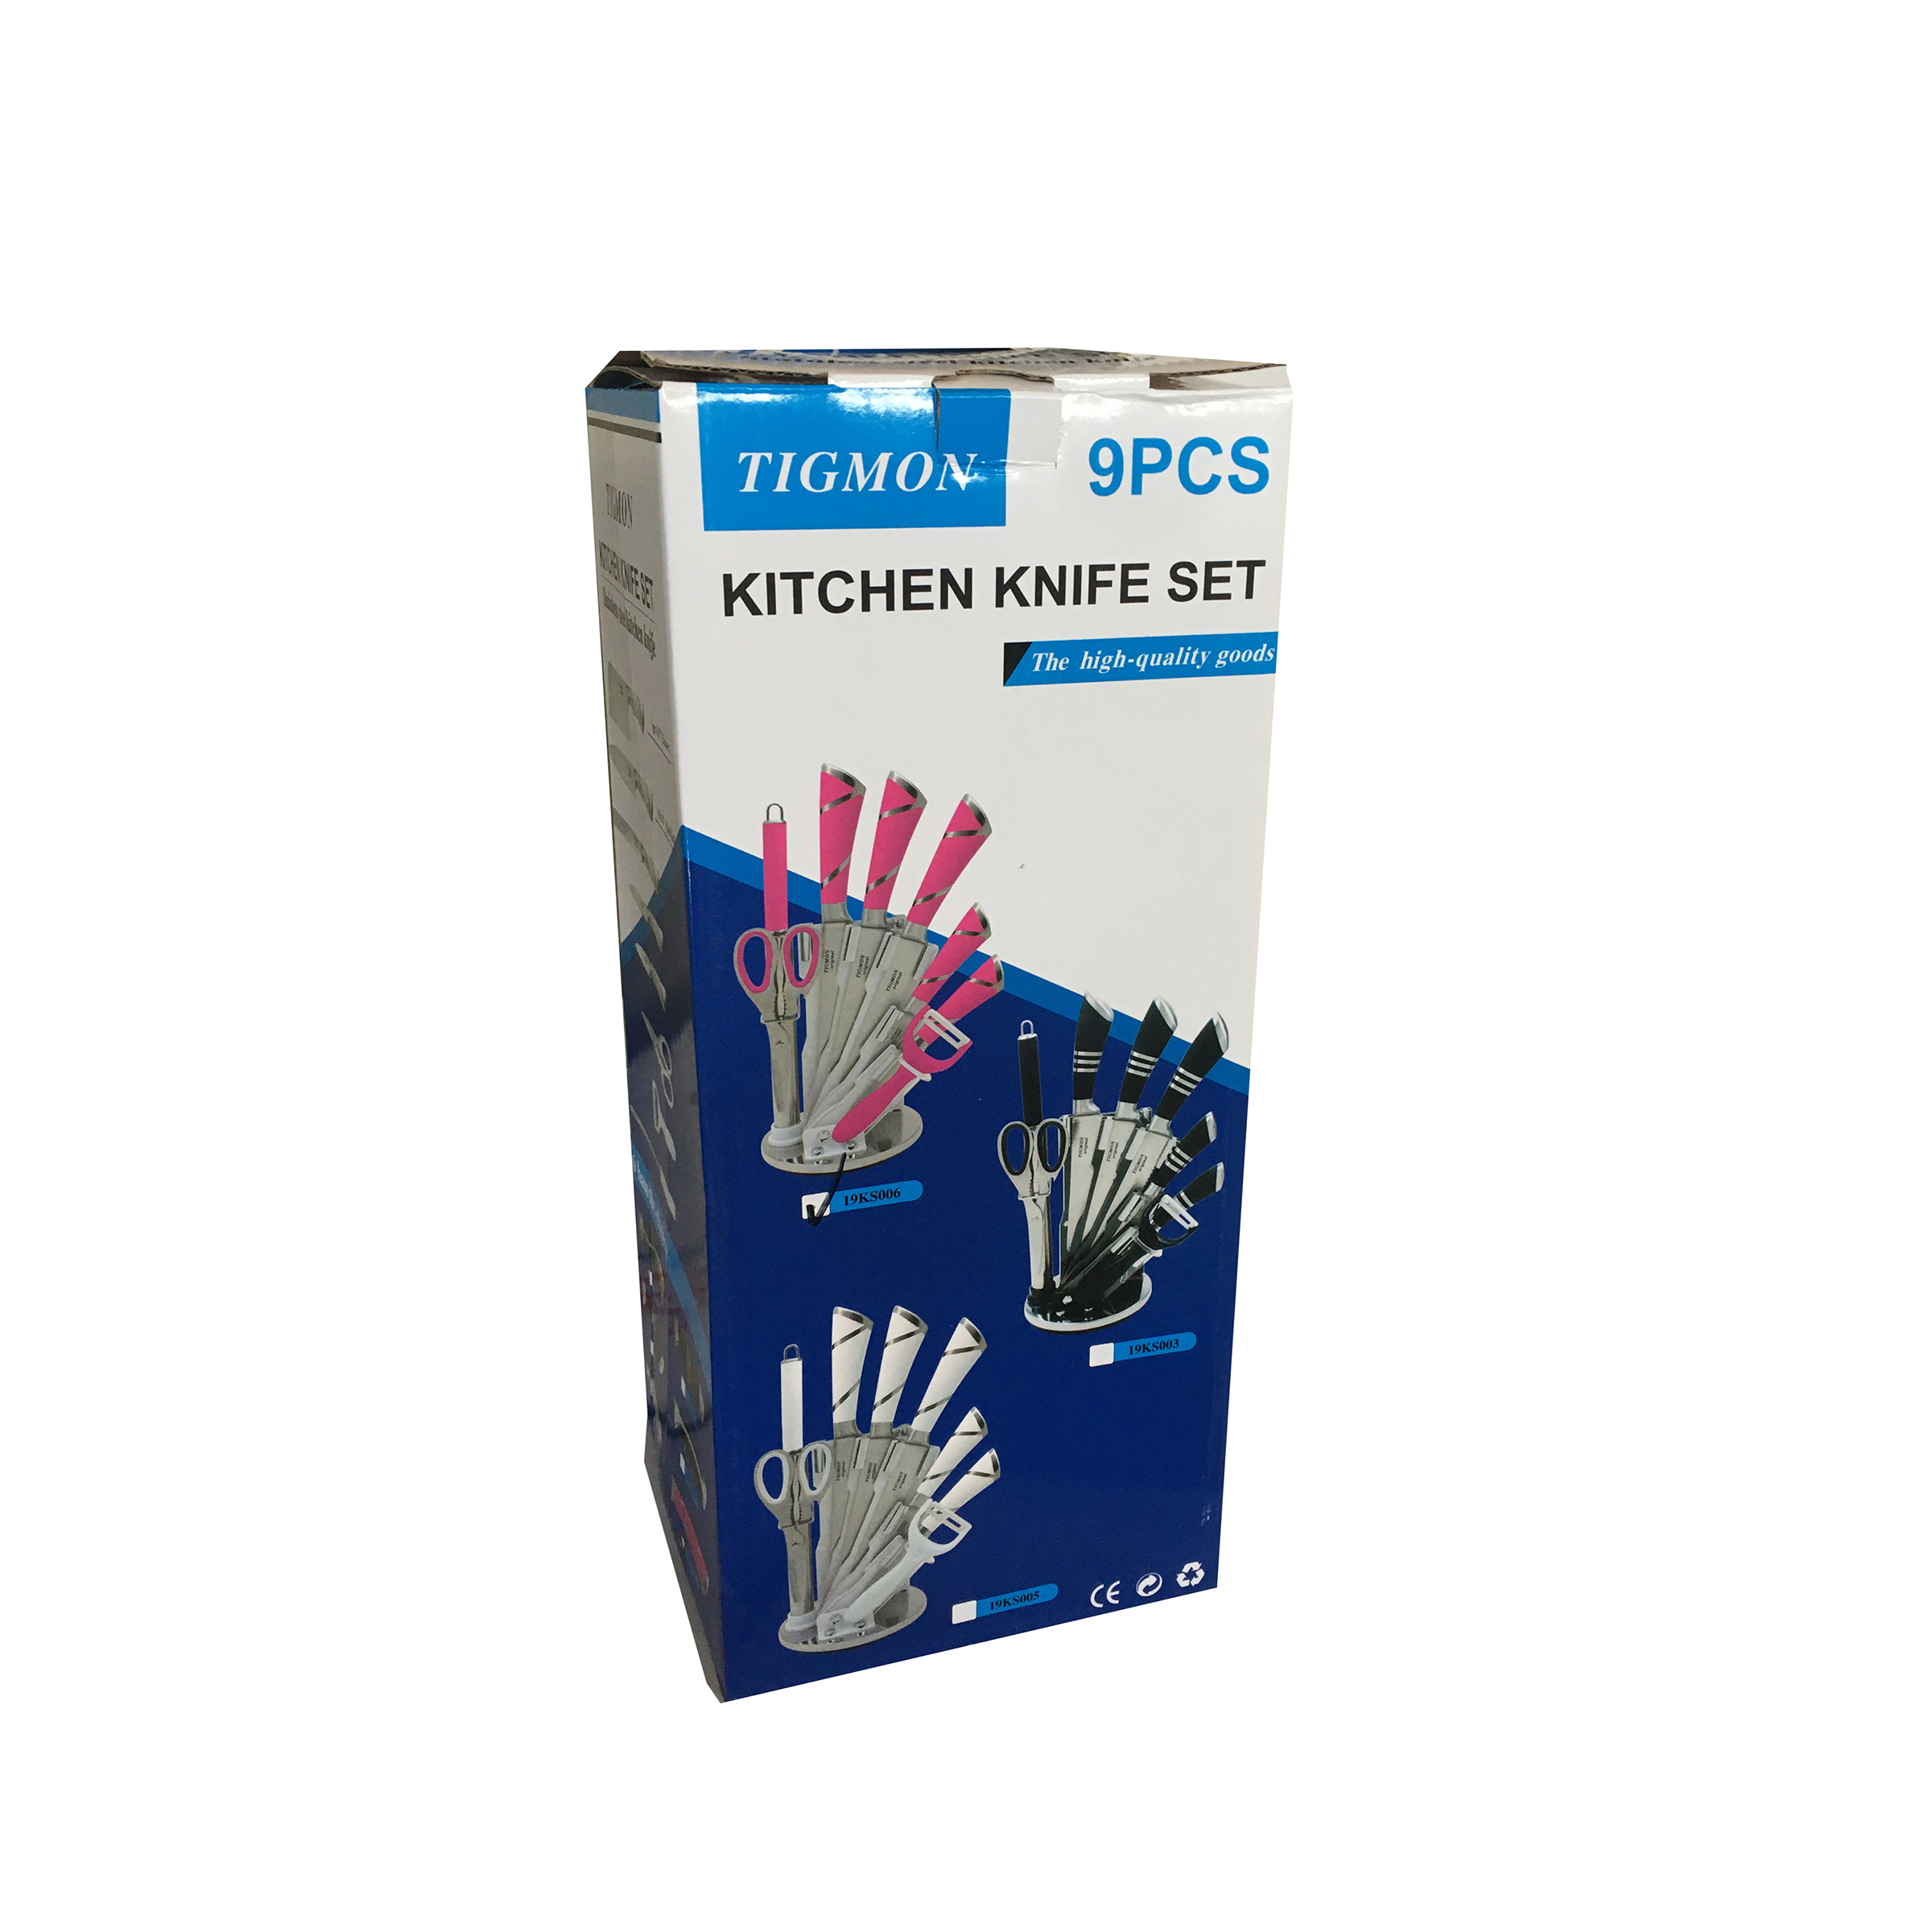 سرویس چاقو آشپزخانه 9 پارچه تیگمون مدل 1012